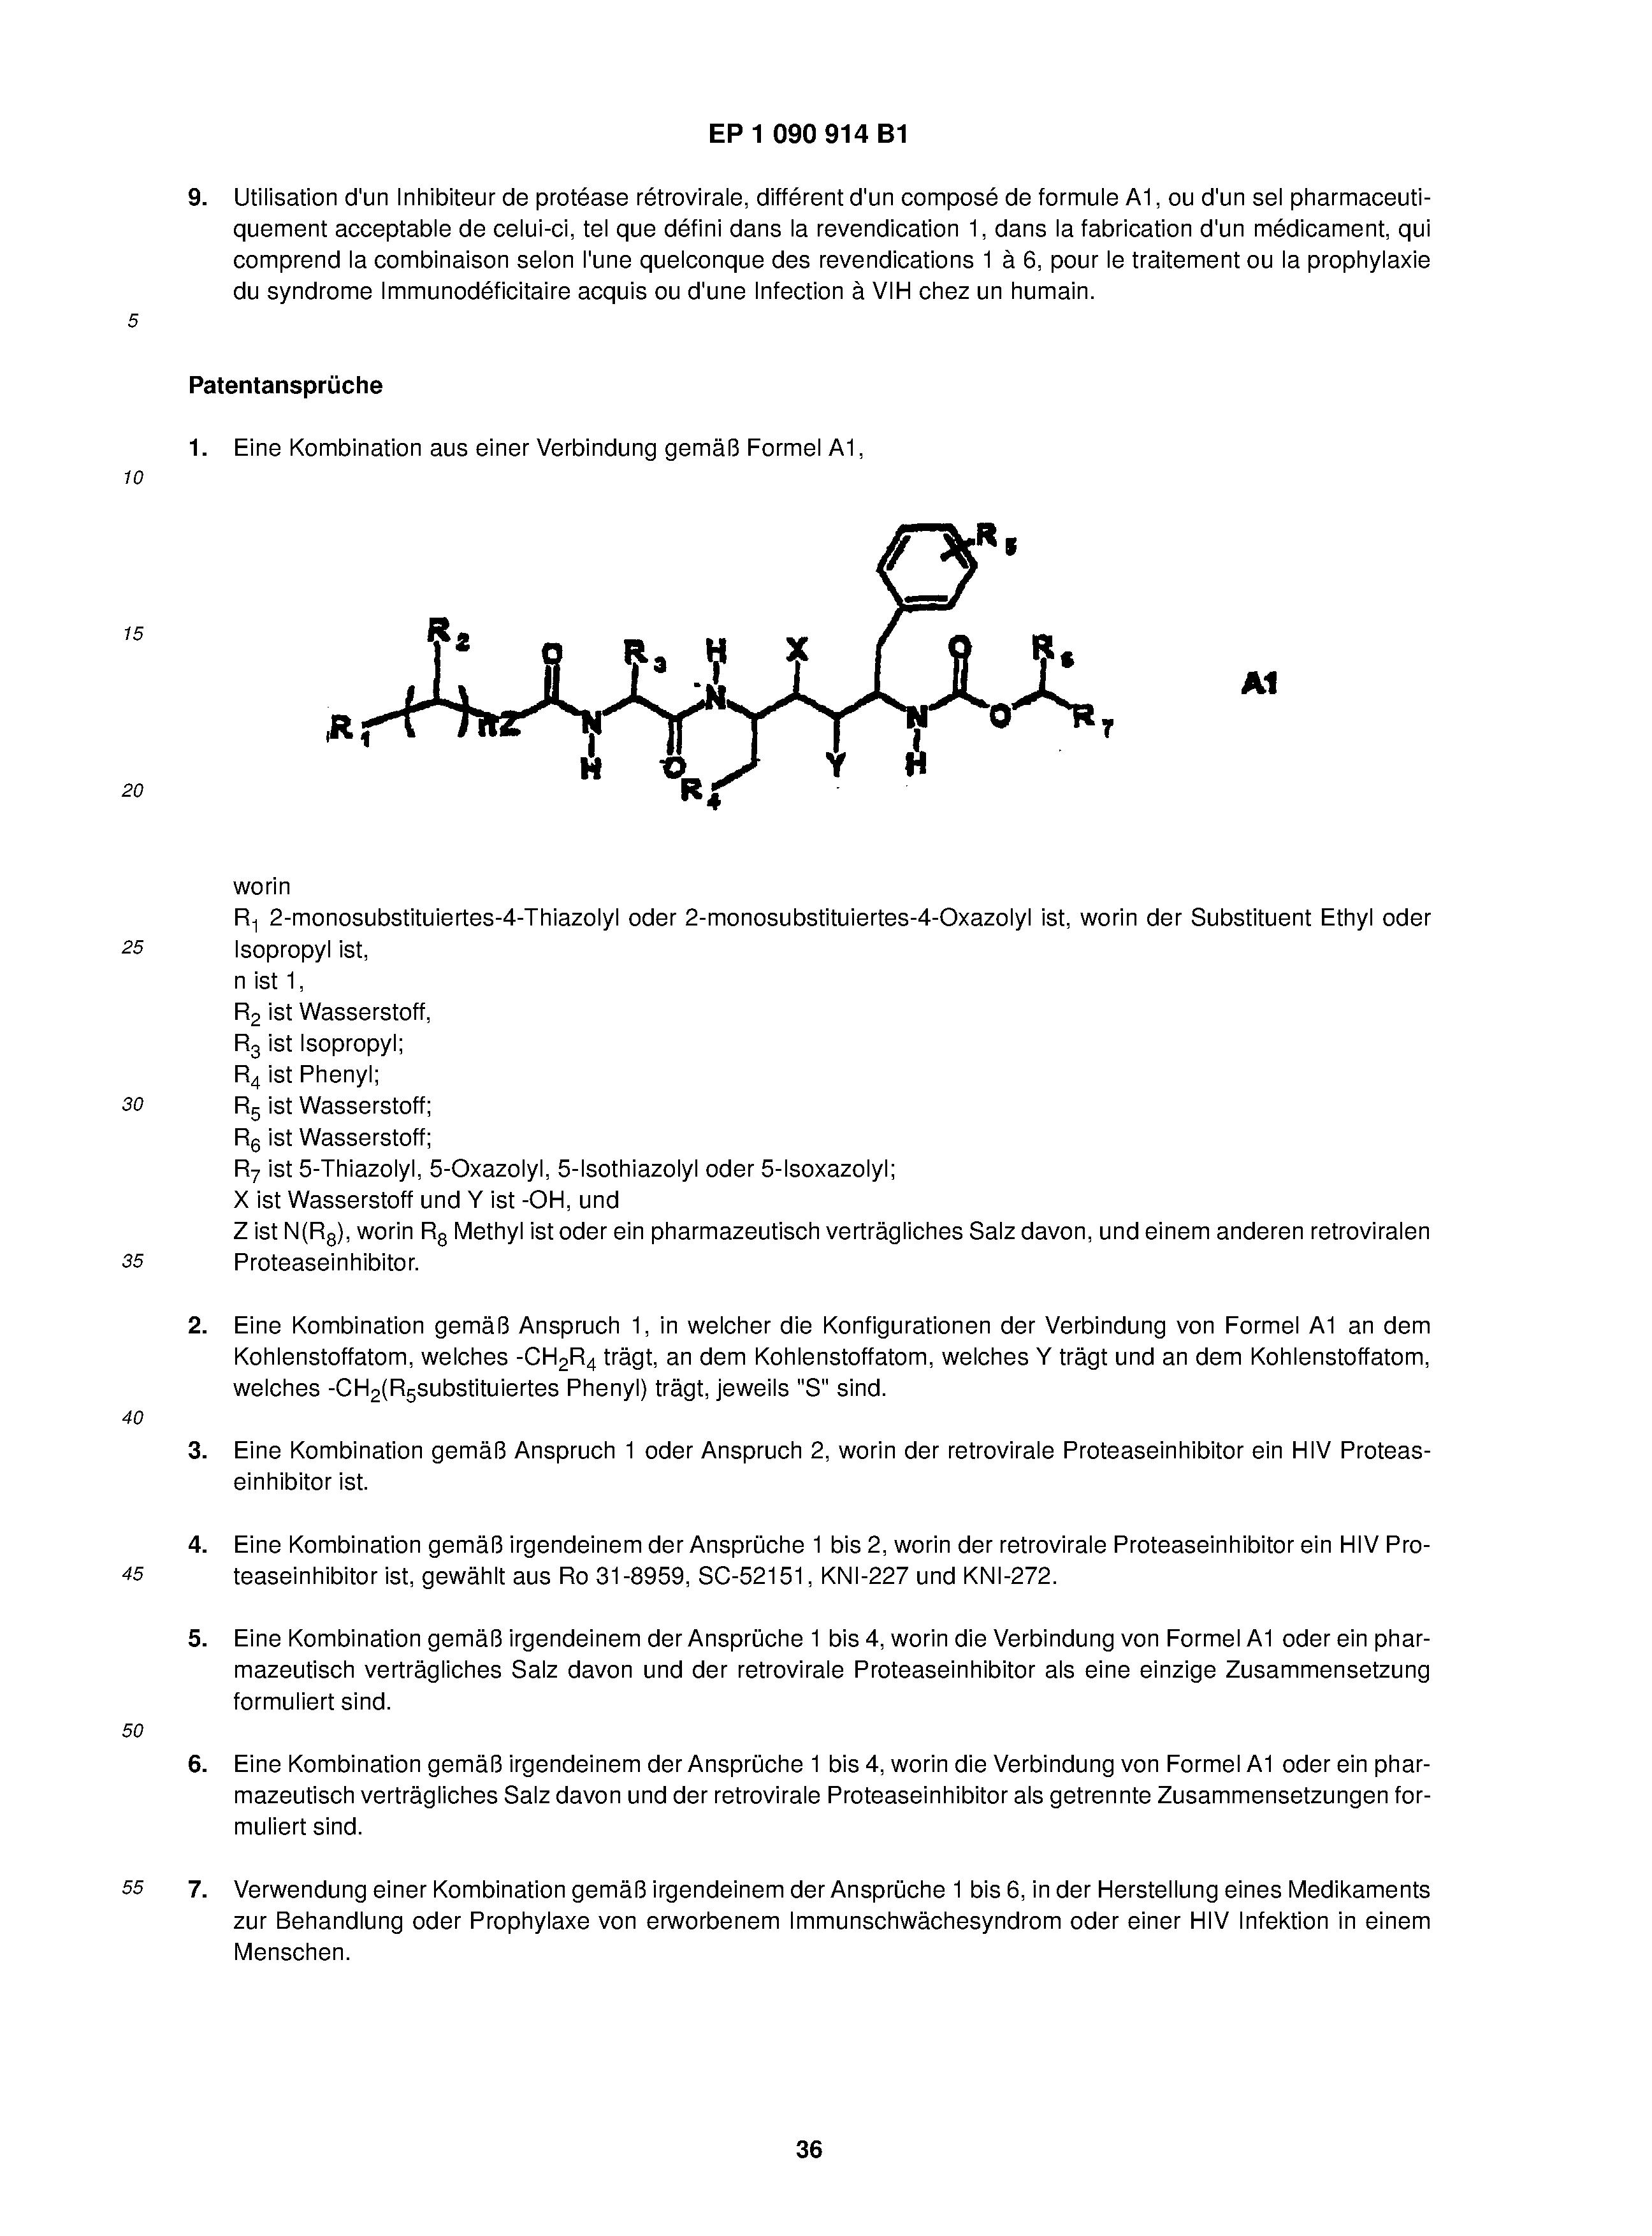 Ca 2585898 C Use Of 2s 3s 5s 5 N N N Methyl N 2 Isopropyl